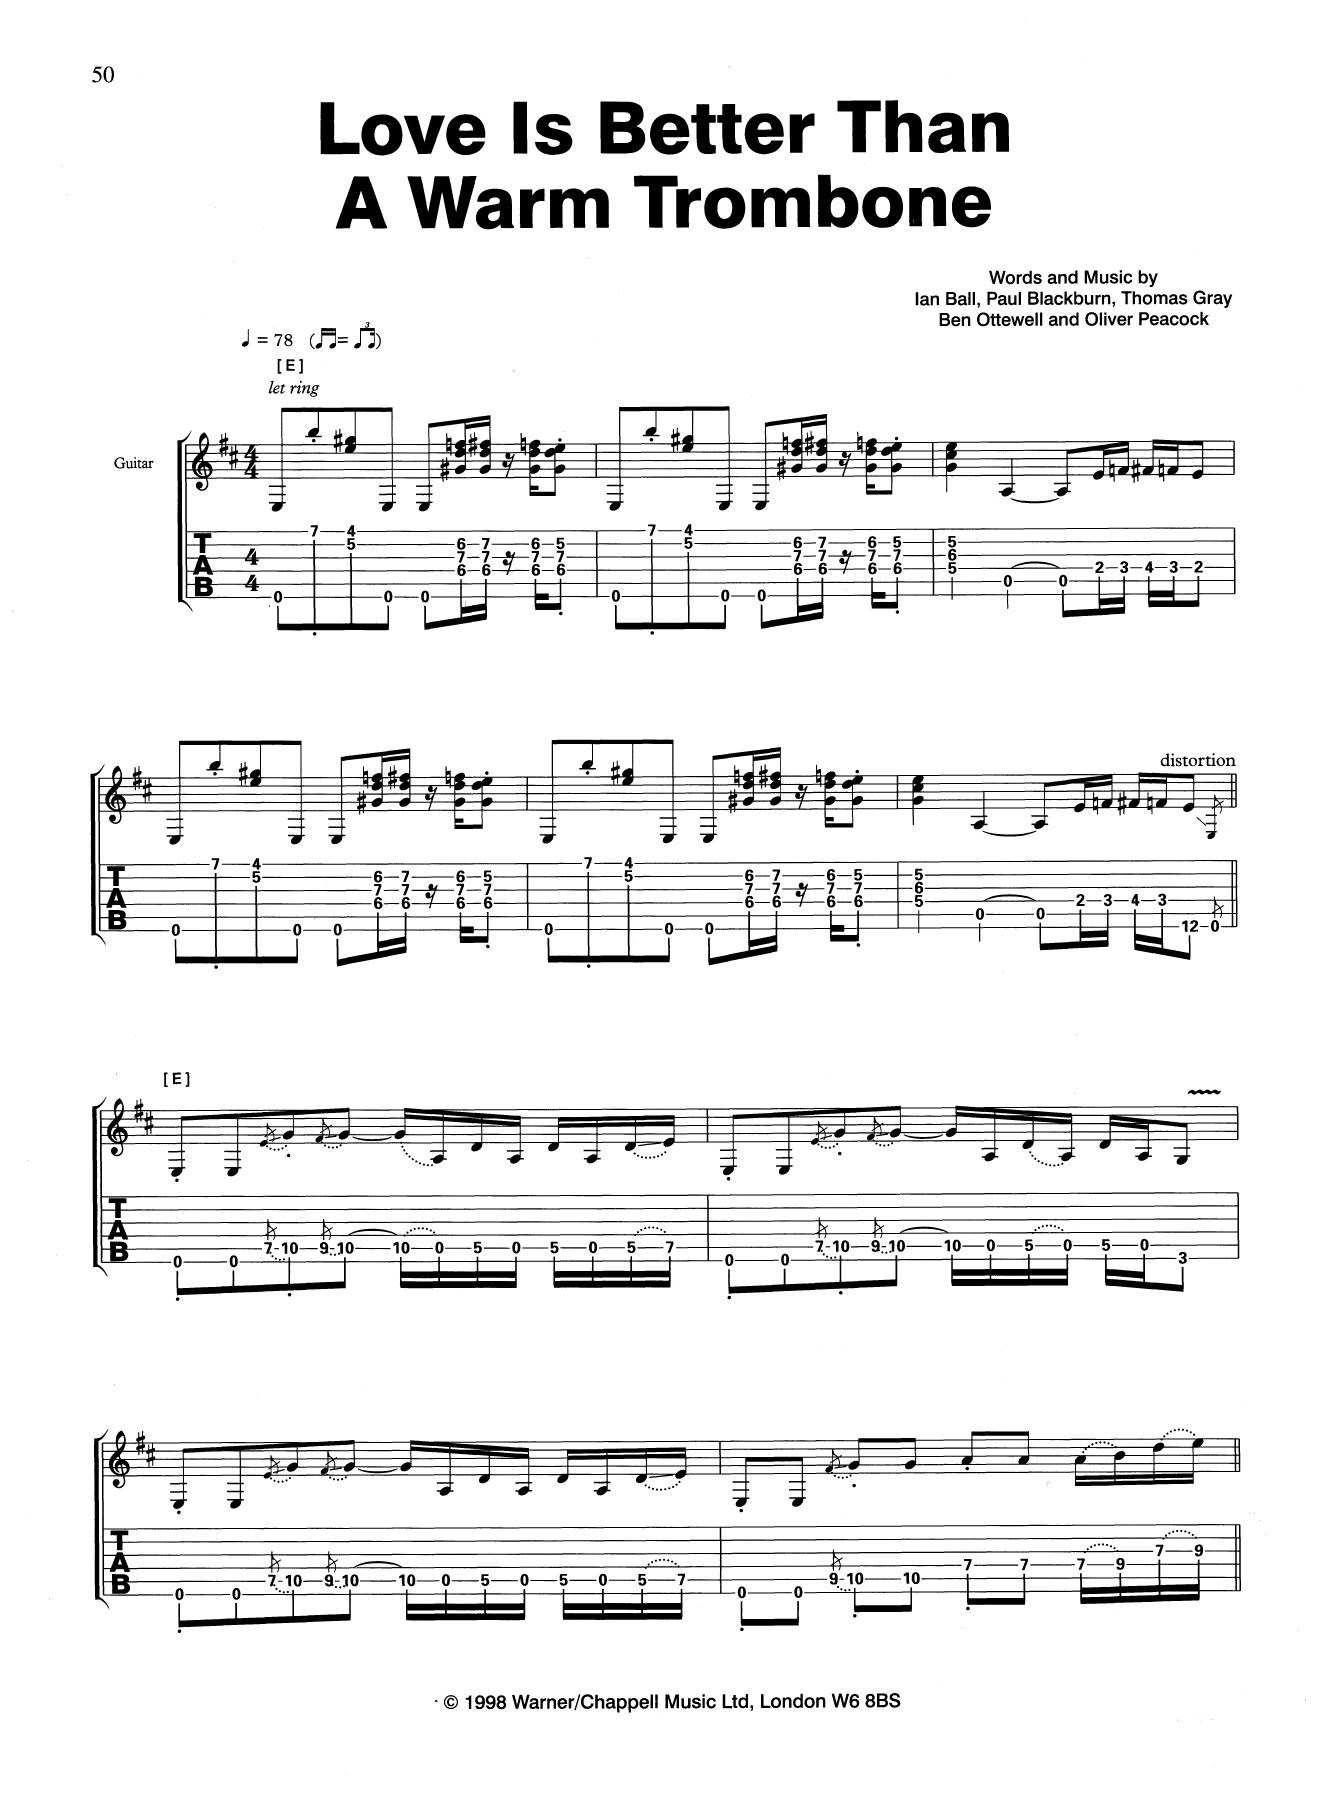 Love Is Better Than A Warm Trombone (Guitar Tab)